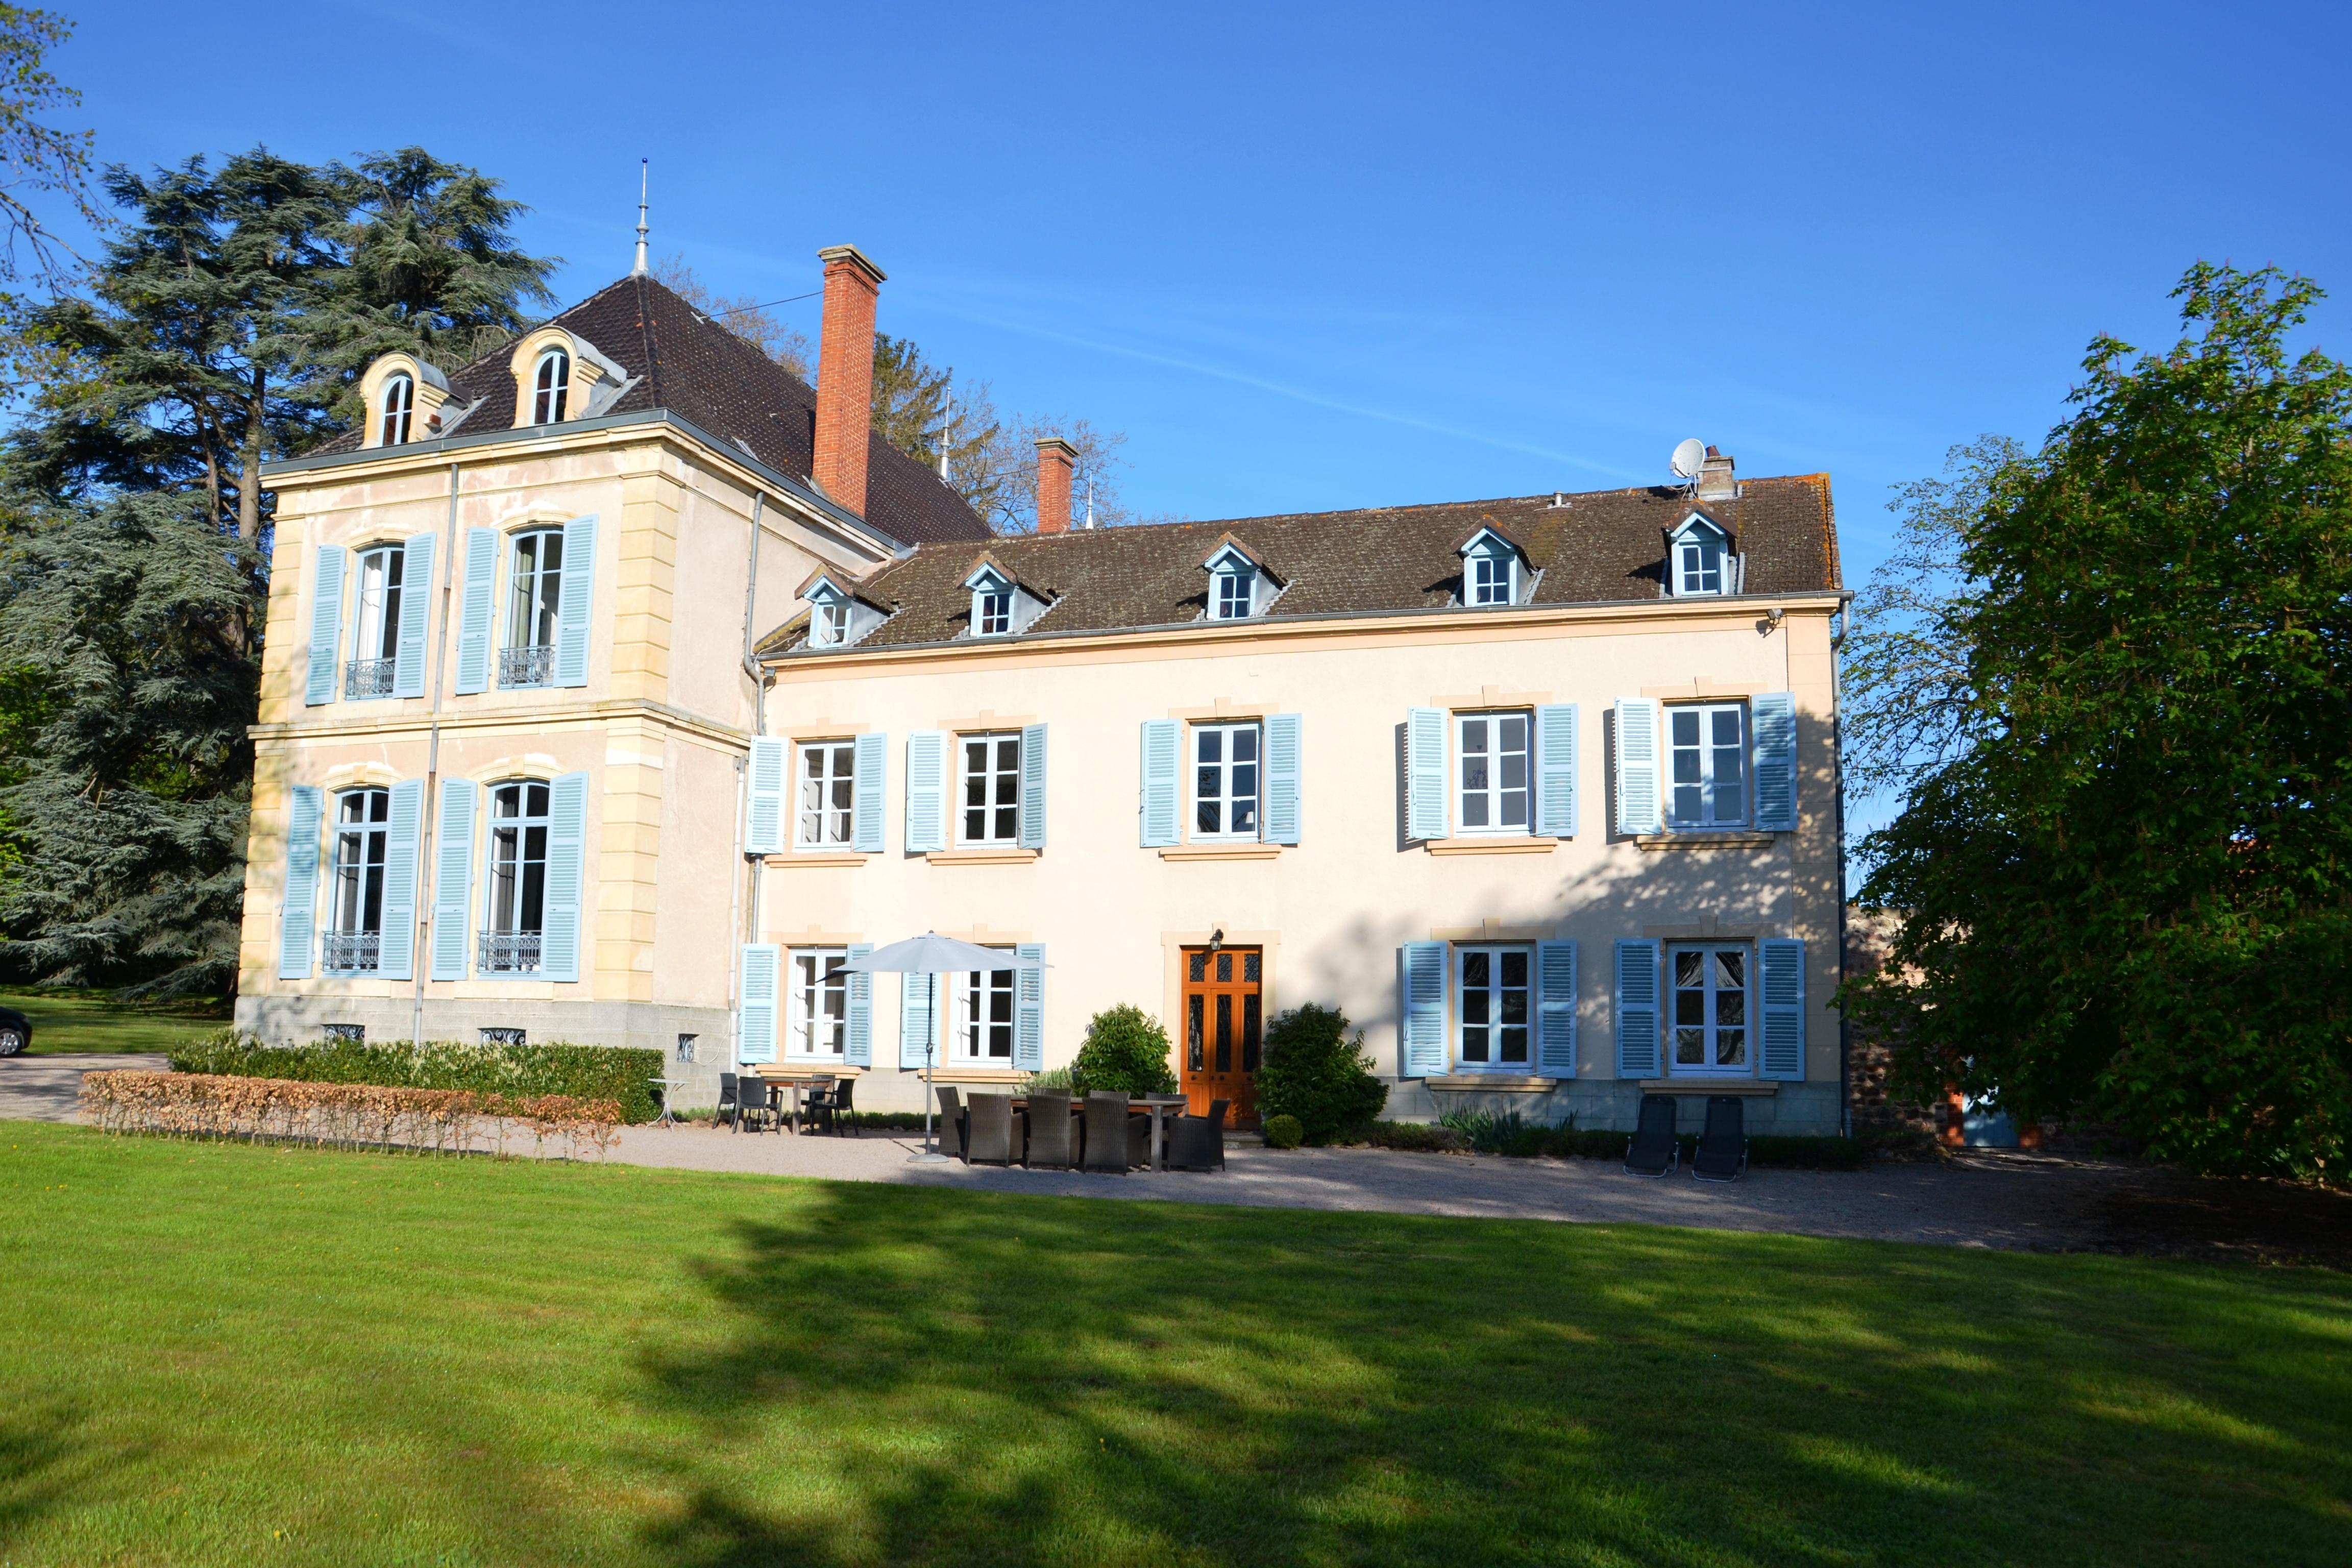 Afbeelding van Domaine du Roi Francois - Château & Maison - kasteelvakantie Frankrijk